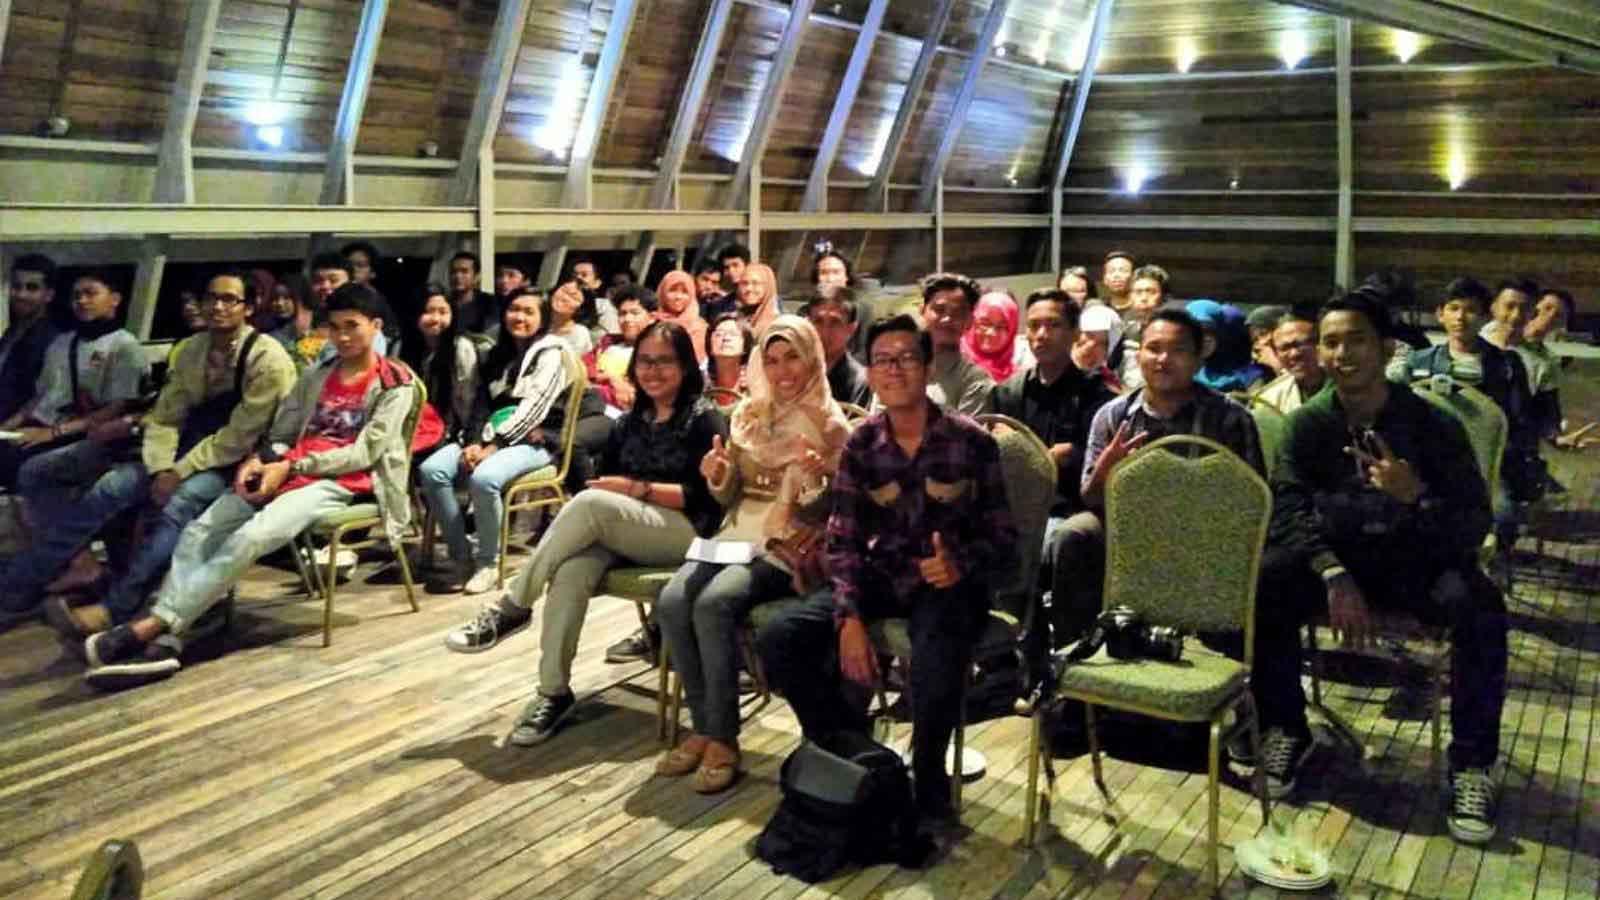 Suasana emutaran Indonesia Raja 2015 di Greenhost Hotel, Yogyakarta